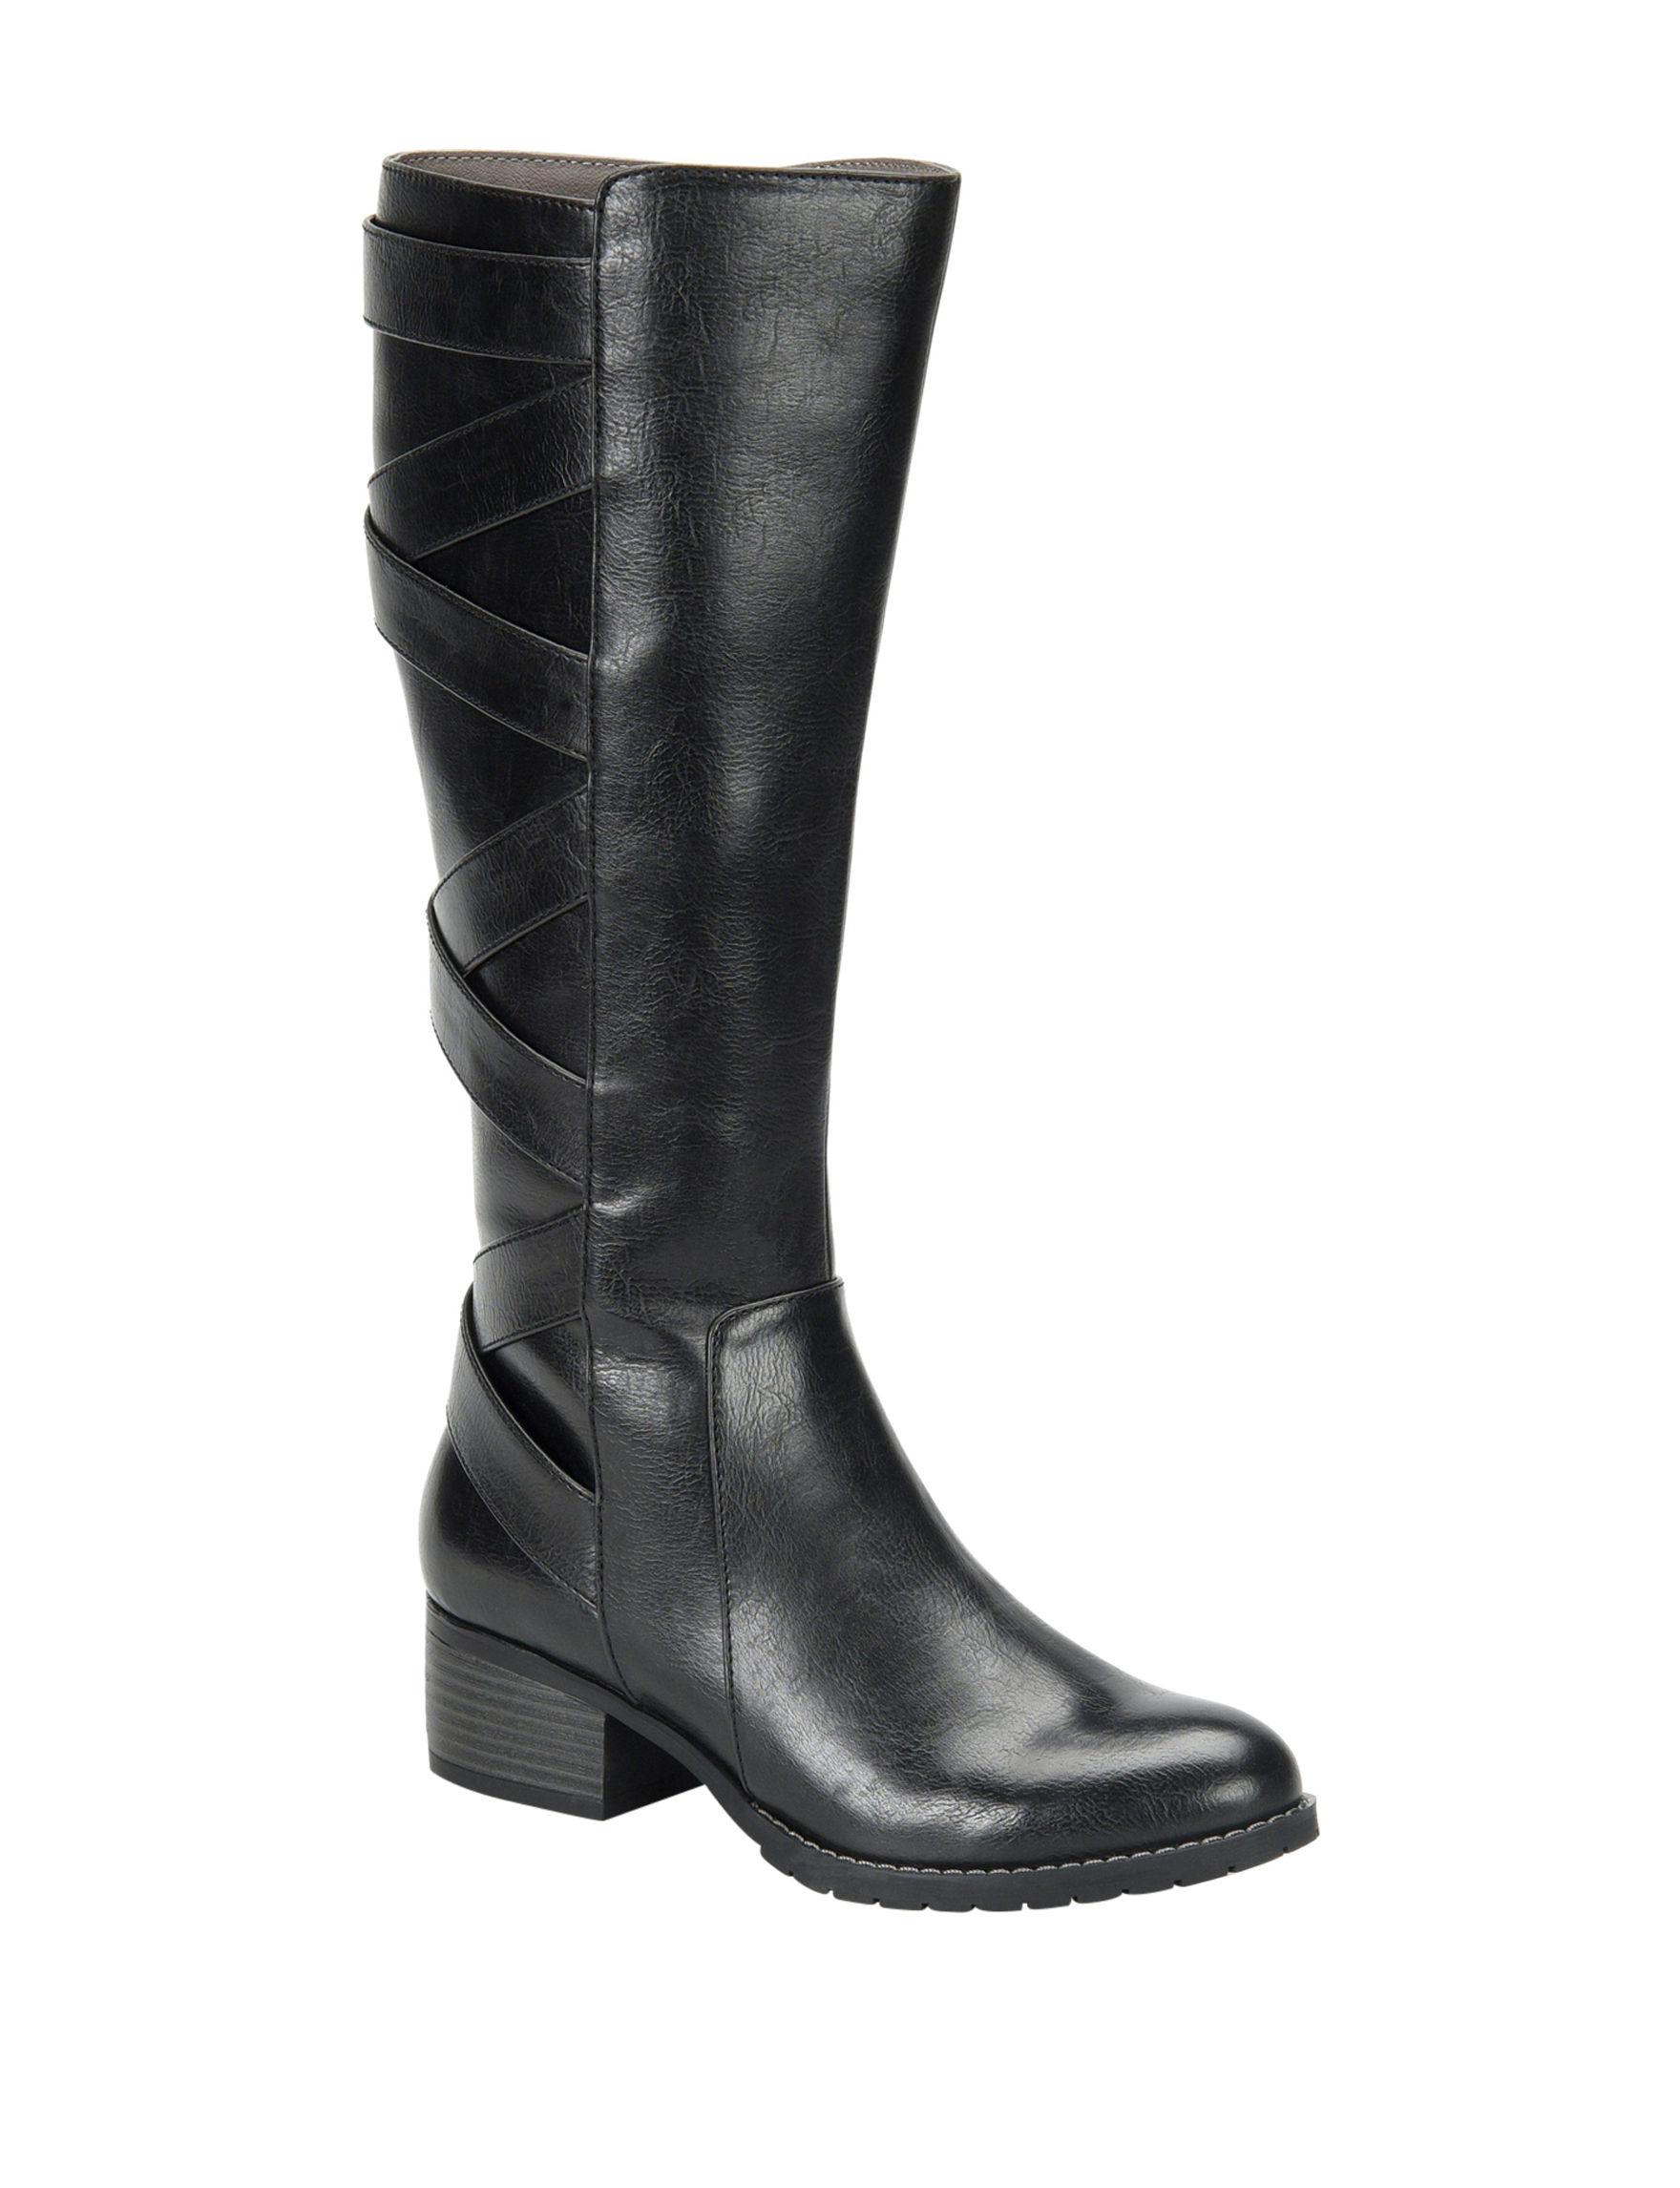 Eurosoft Black Riding Boots